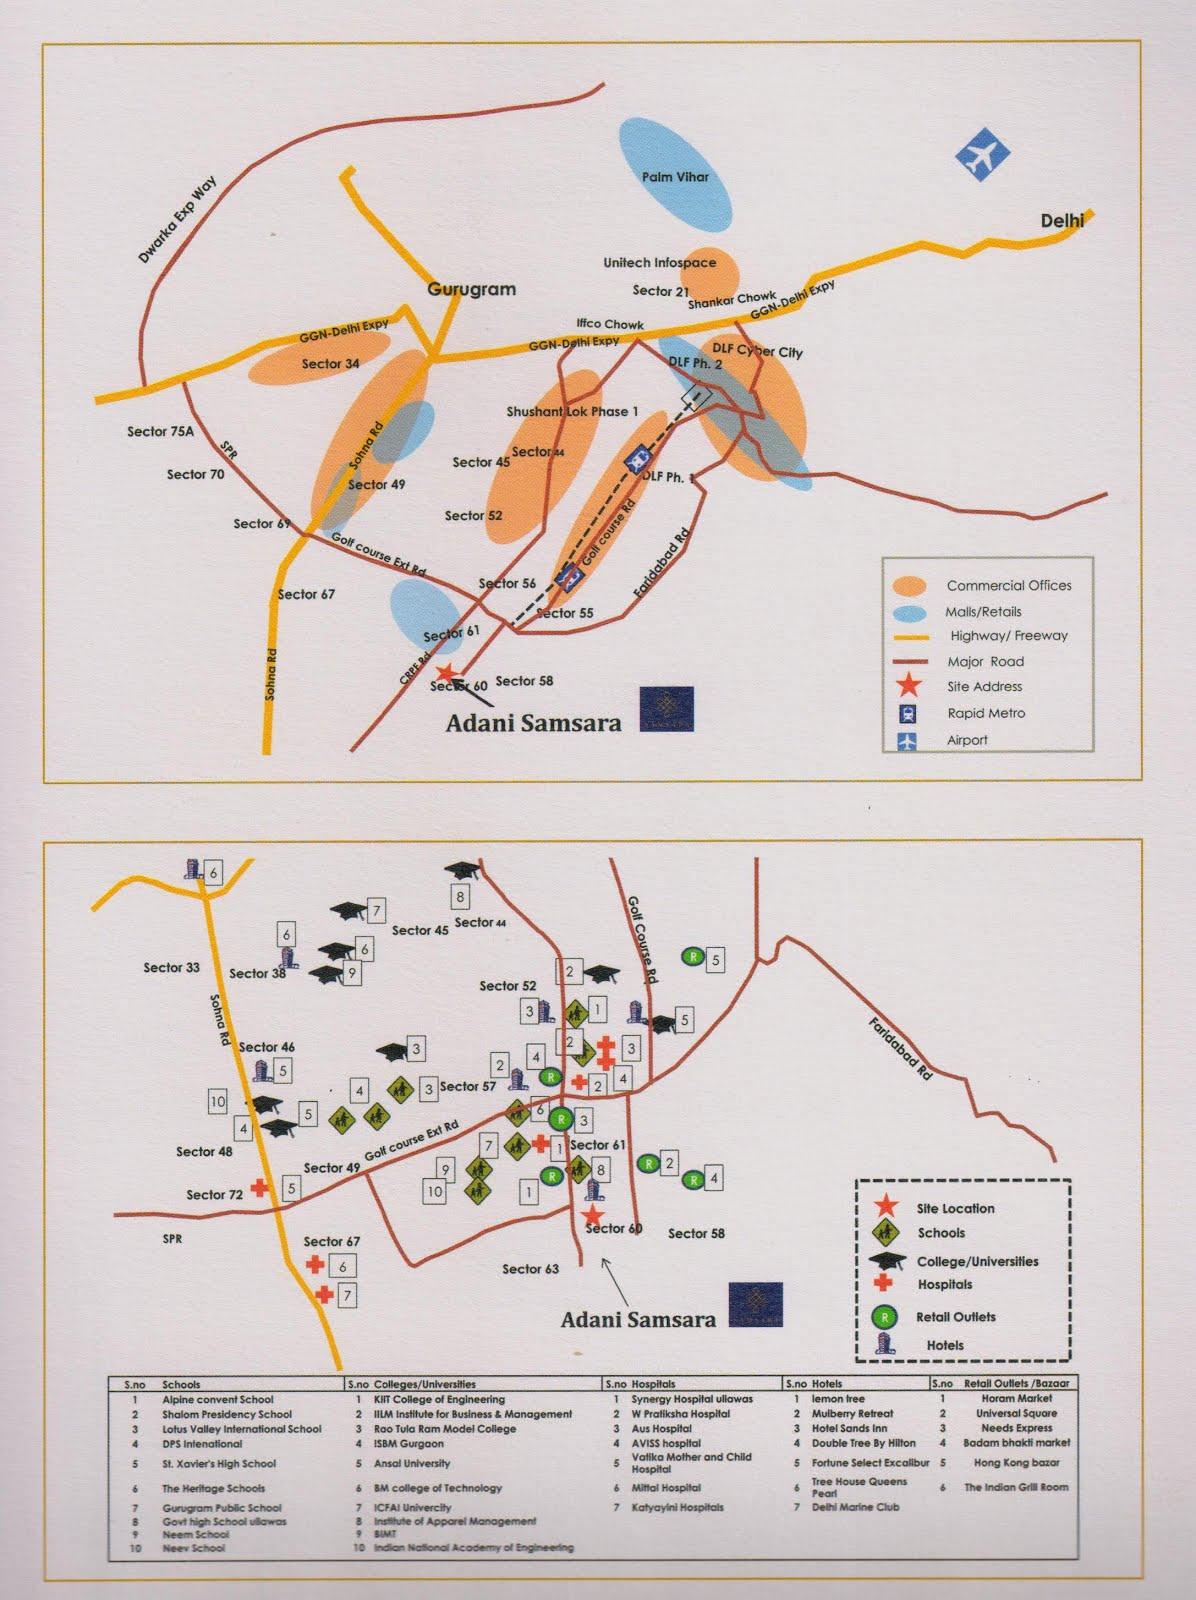 Adani-samsara-locations